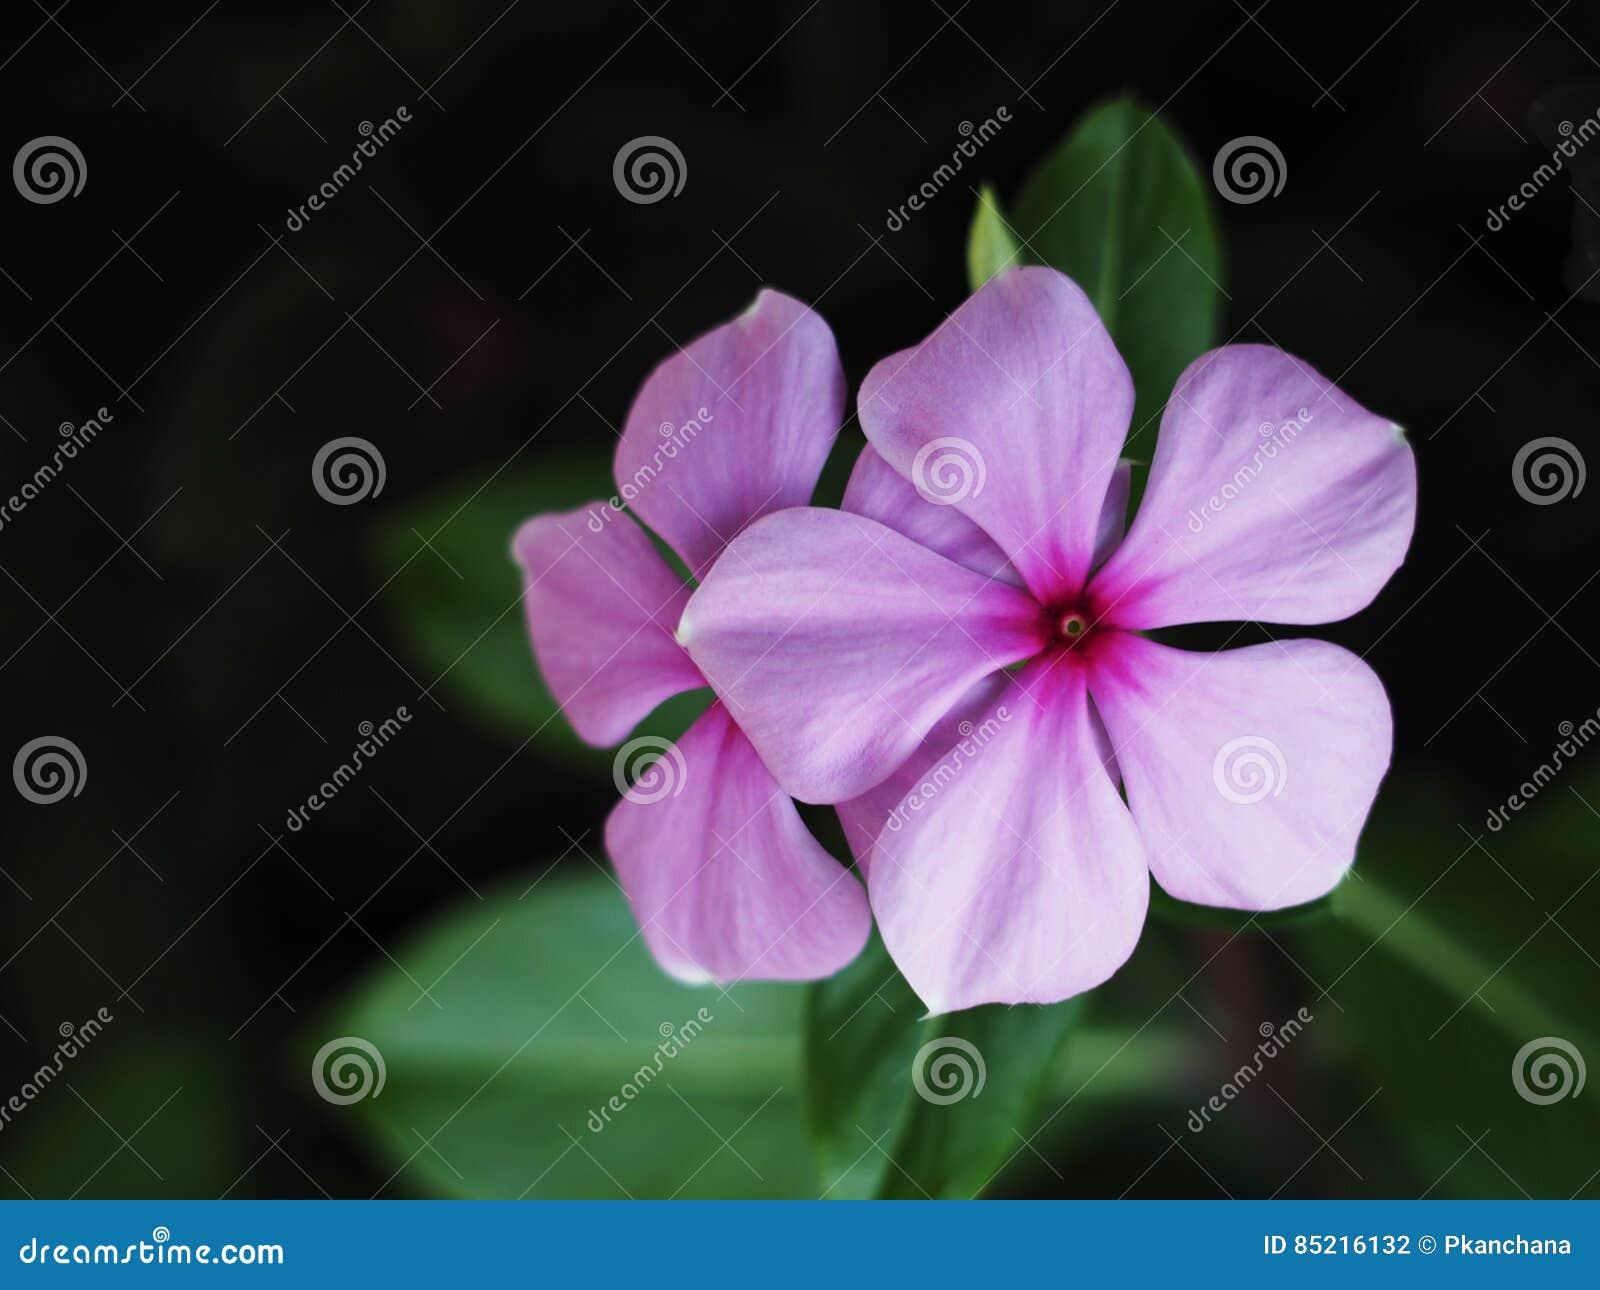 Pink vinca flowers madagascar periwinkle stock photo image of herb download pink vinca flowers madagascar periwinkle stock photo image of herb garden 85216132 mightylinksfo